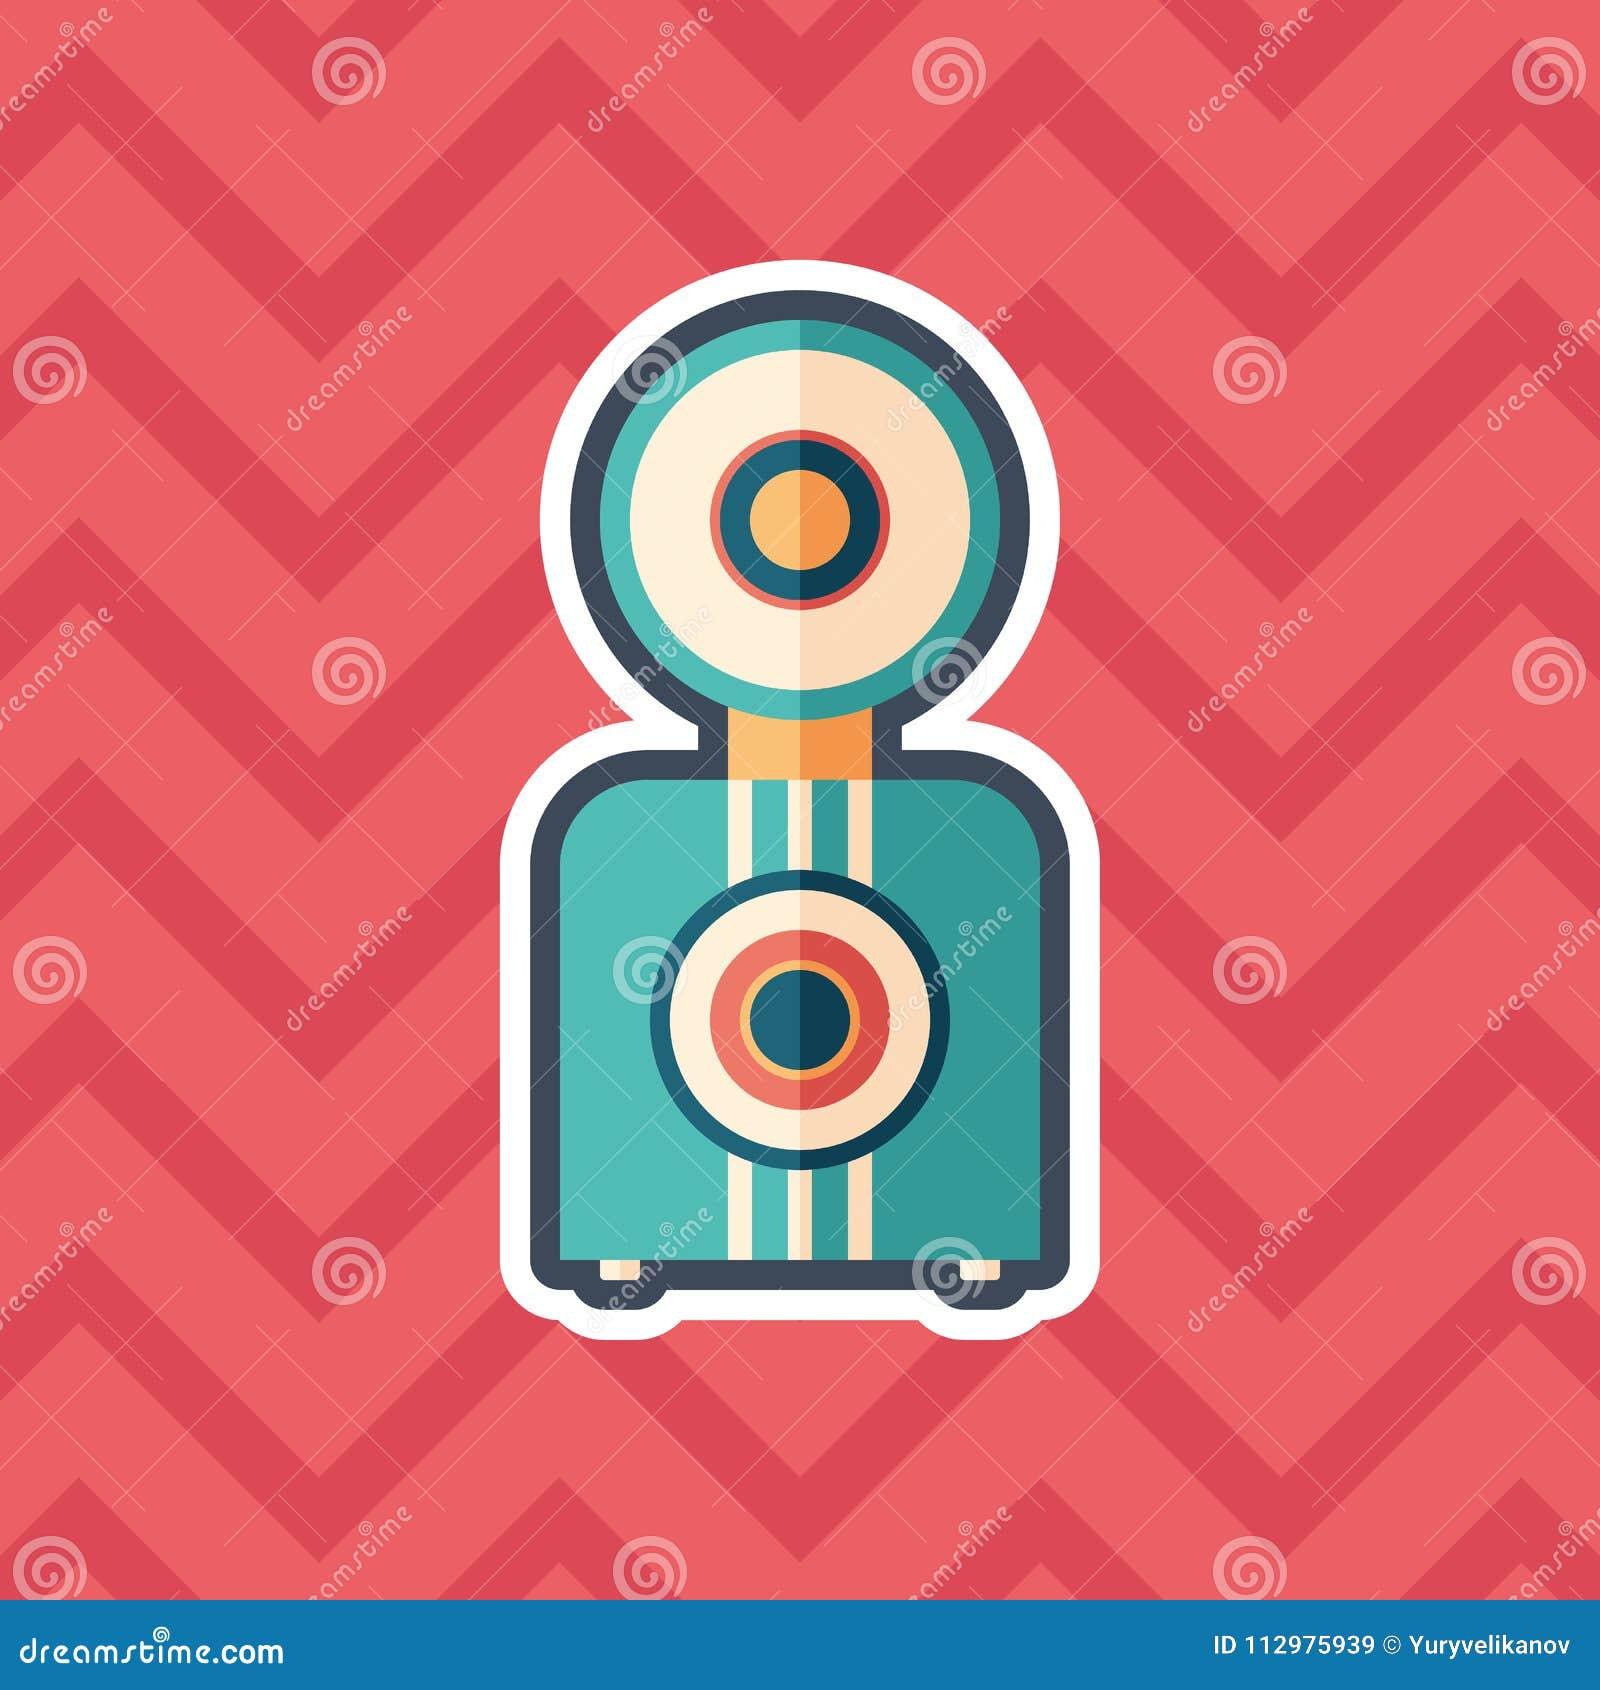 Retro camera sticker flat icon with color background.